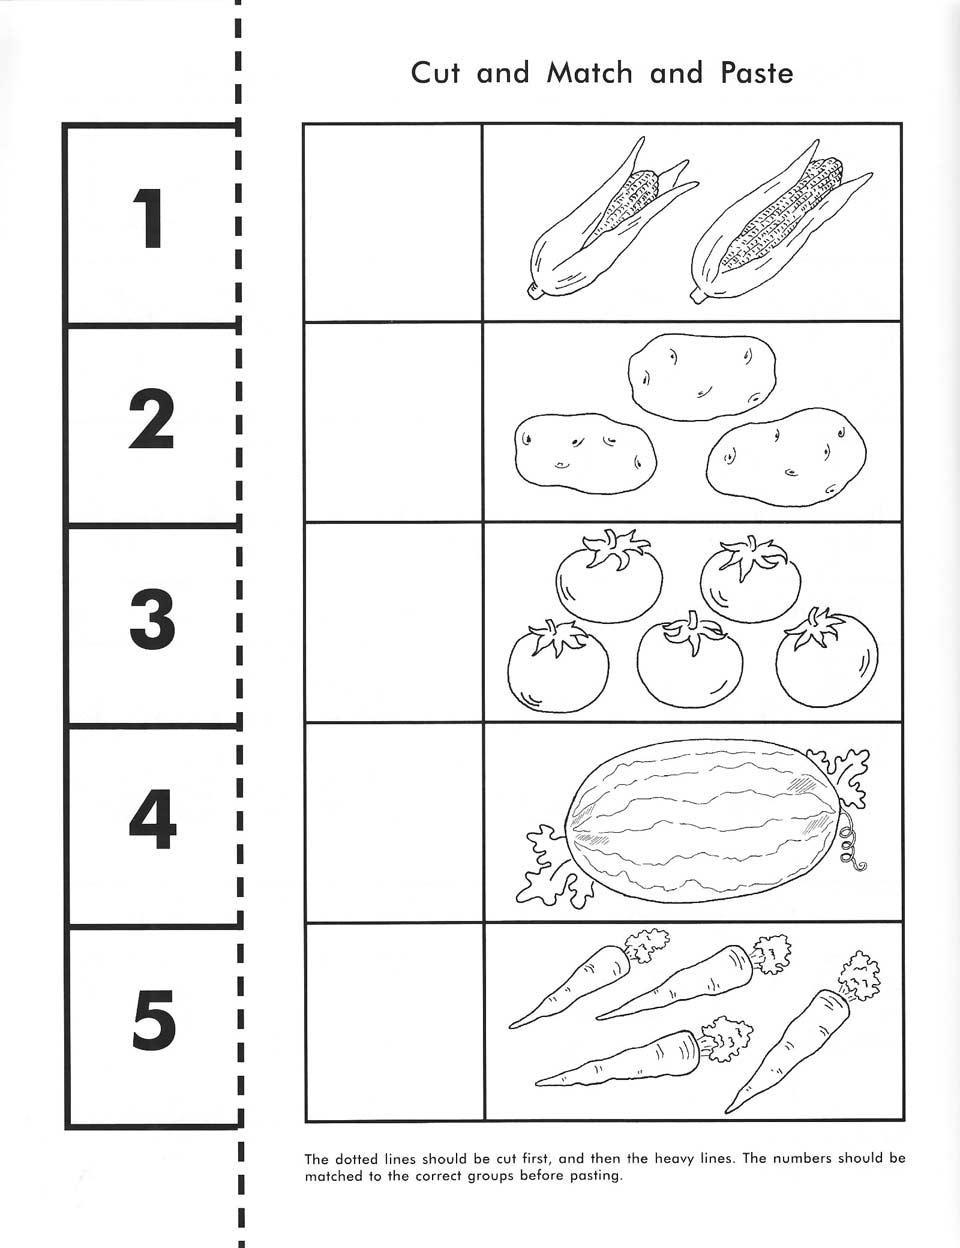 Kindergarten: Esl Printable Worksheets For Kids Games Christmas - Free Printable Activities For Preschoolers